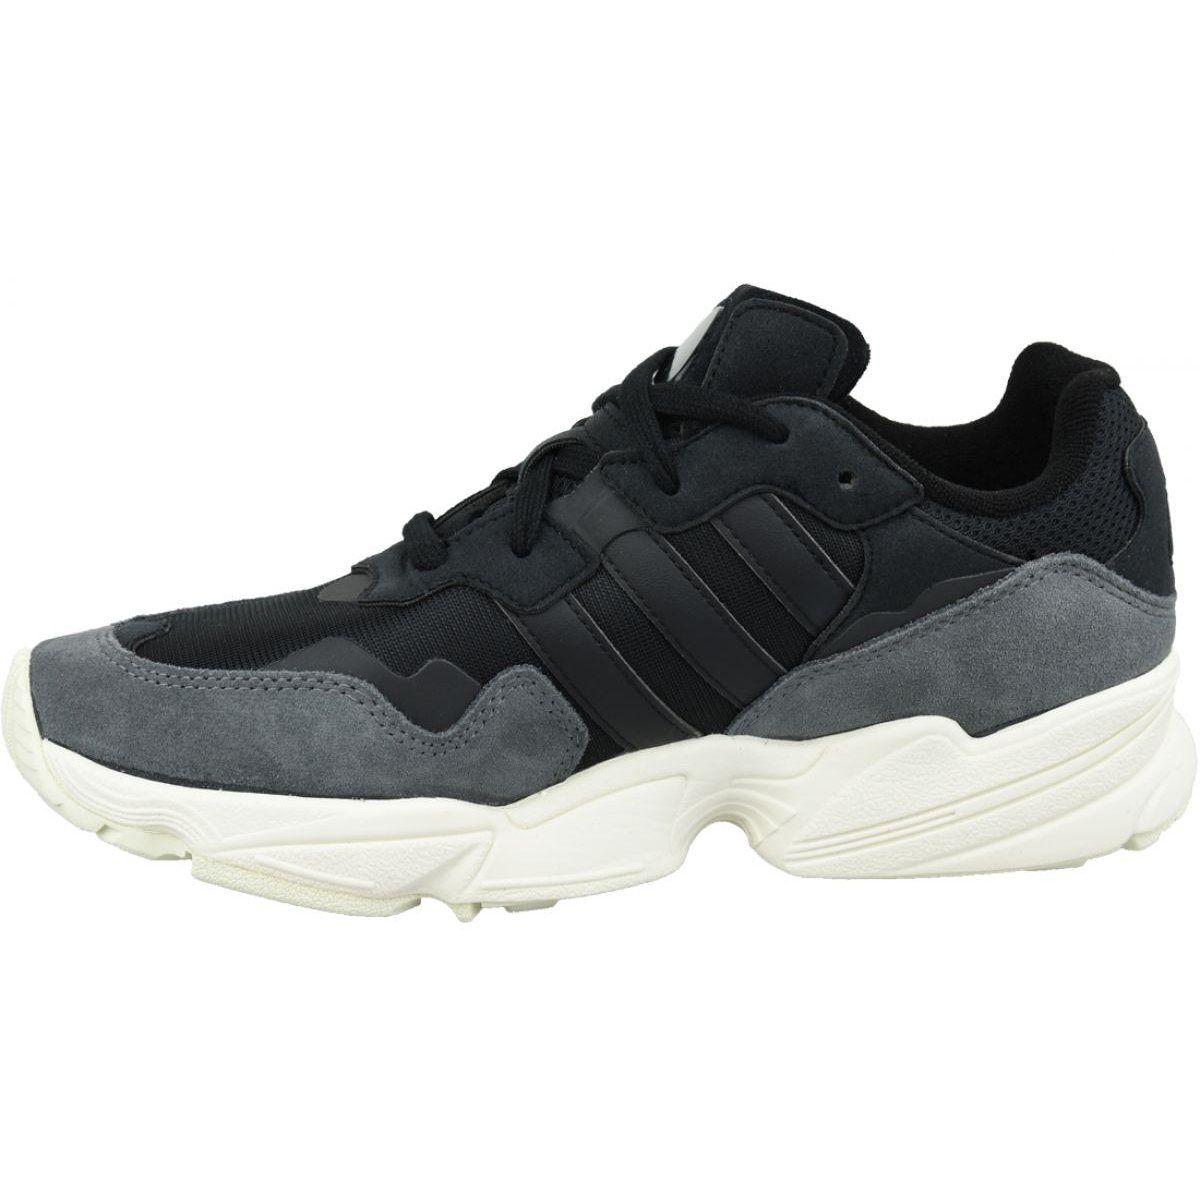 Buty Adidas Yung 96 M Ee7245 Czarne